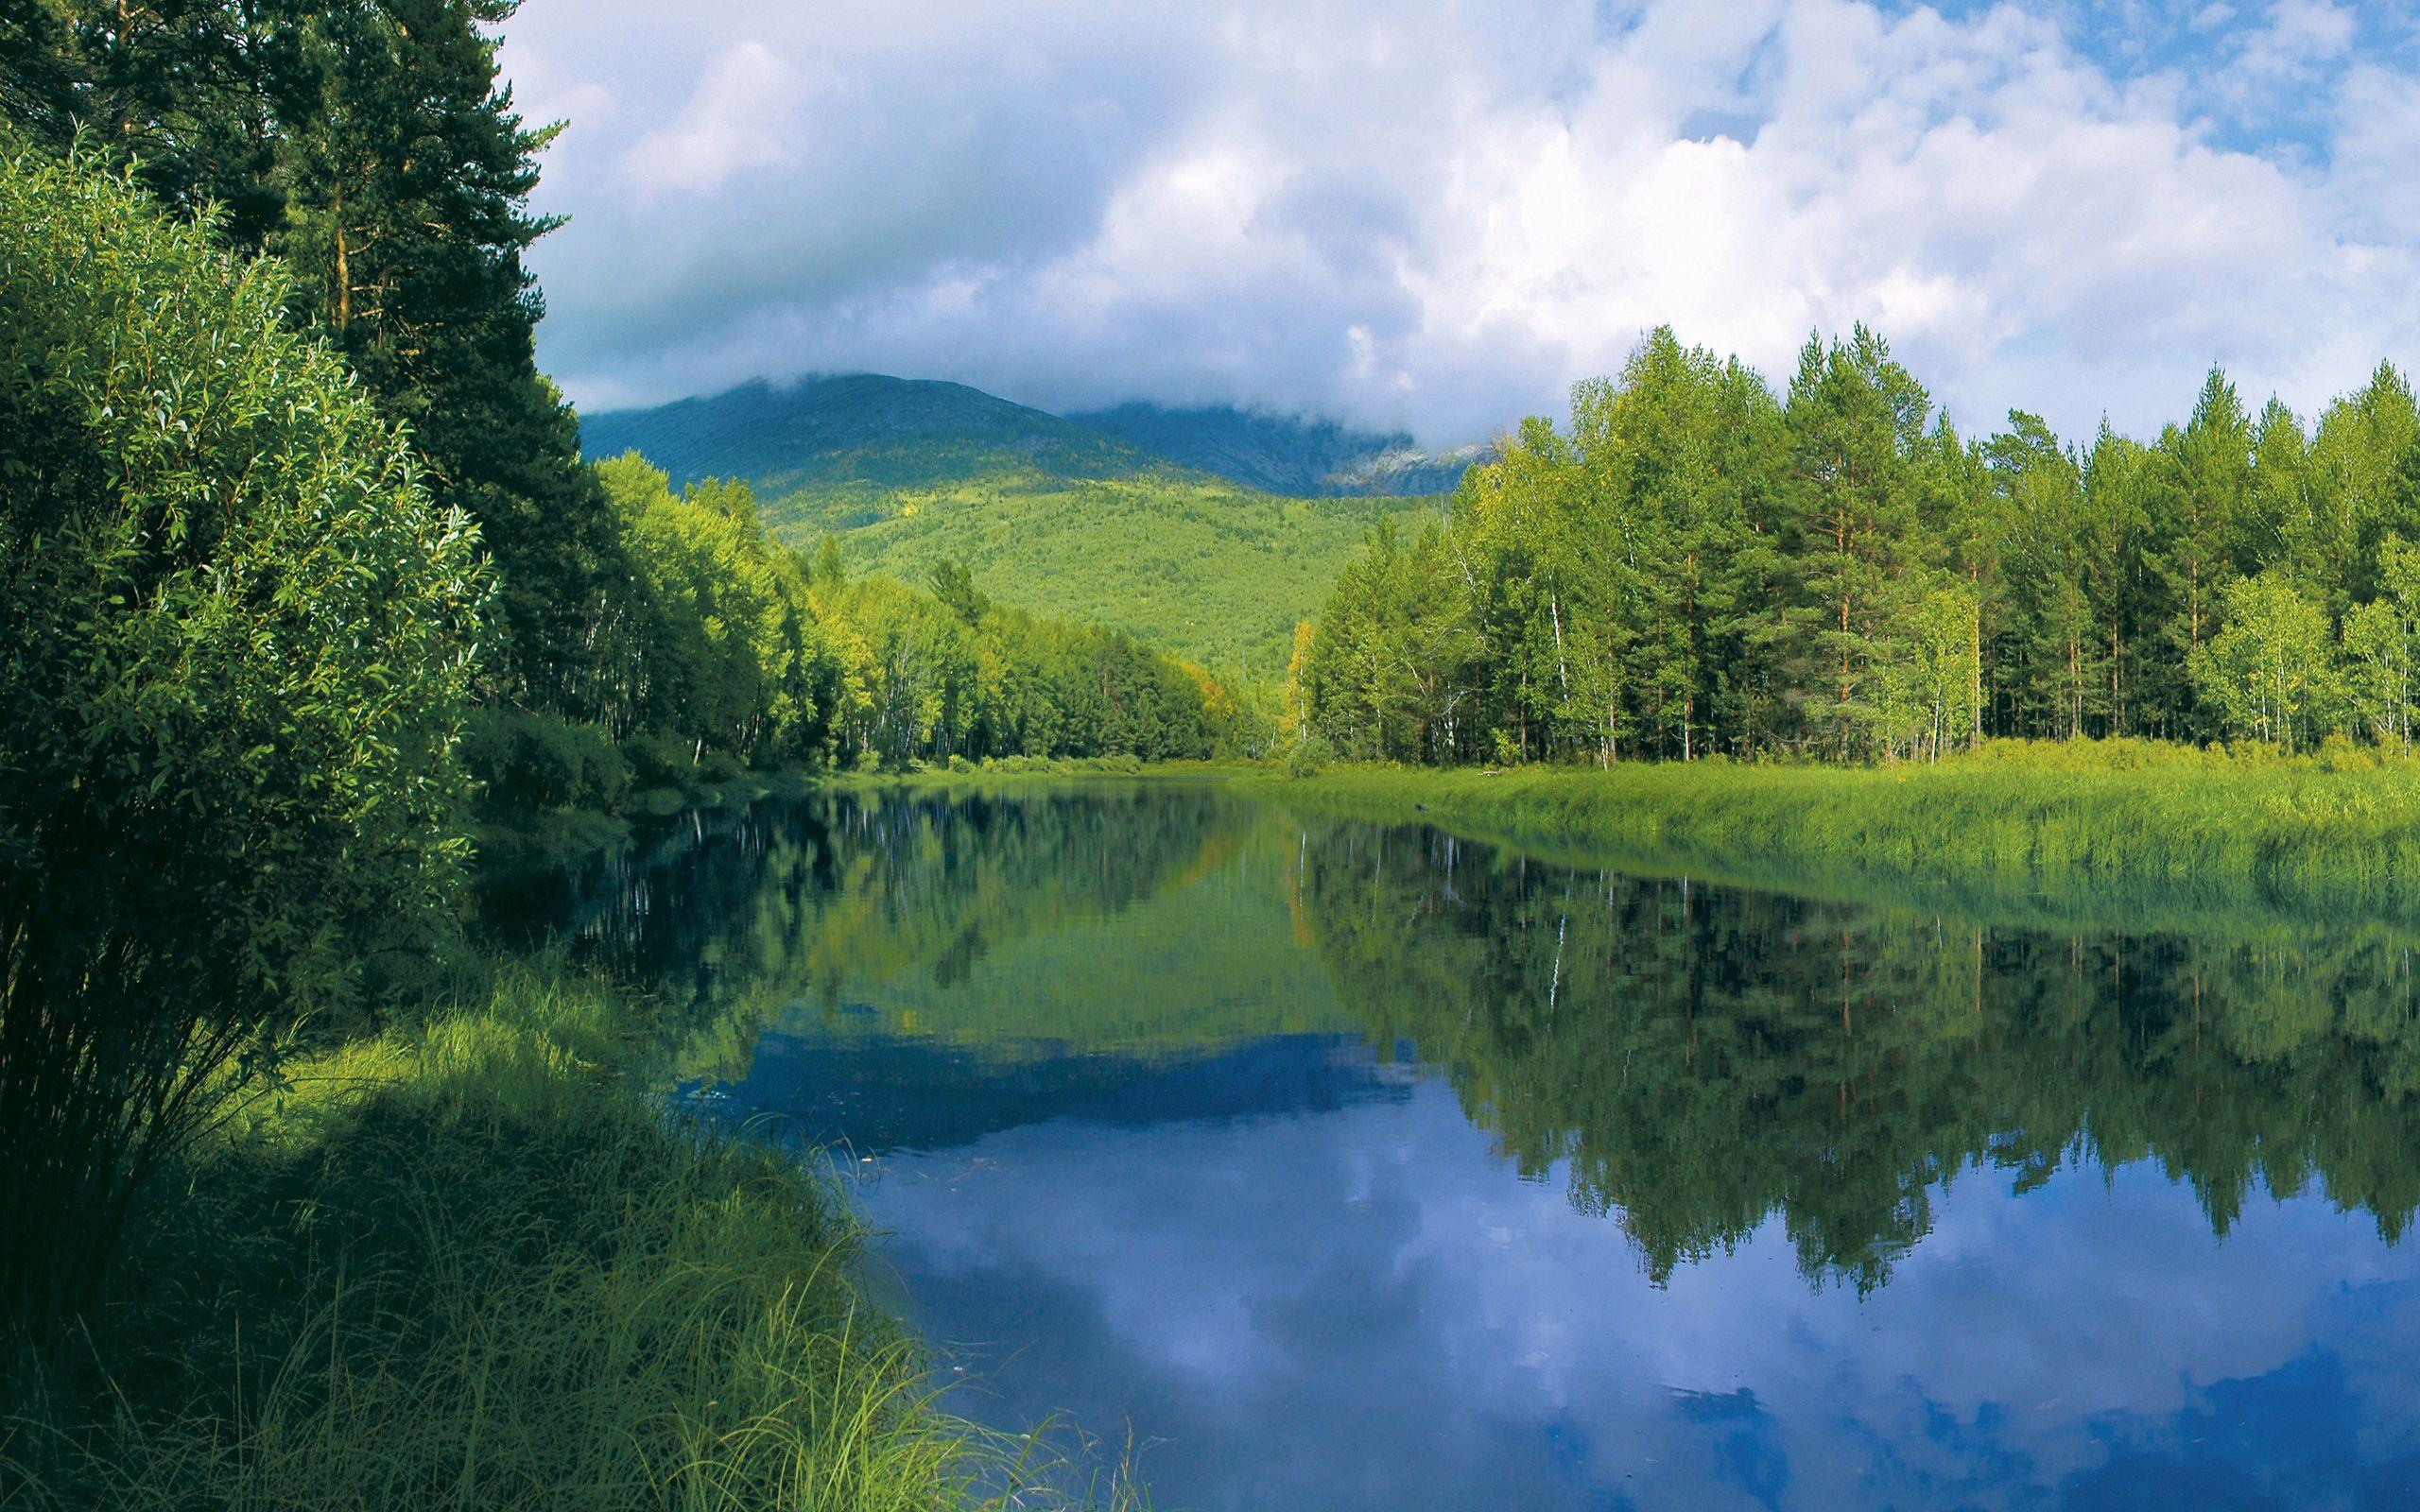 Fondos de pantalla de paisajes hermosos en hd gratis para for Fondo de pantalla primavera